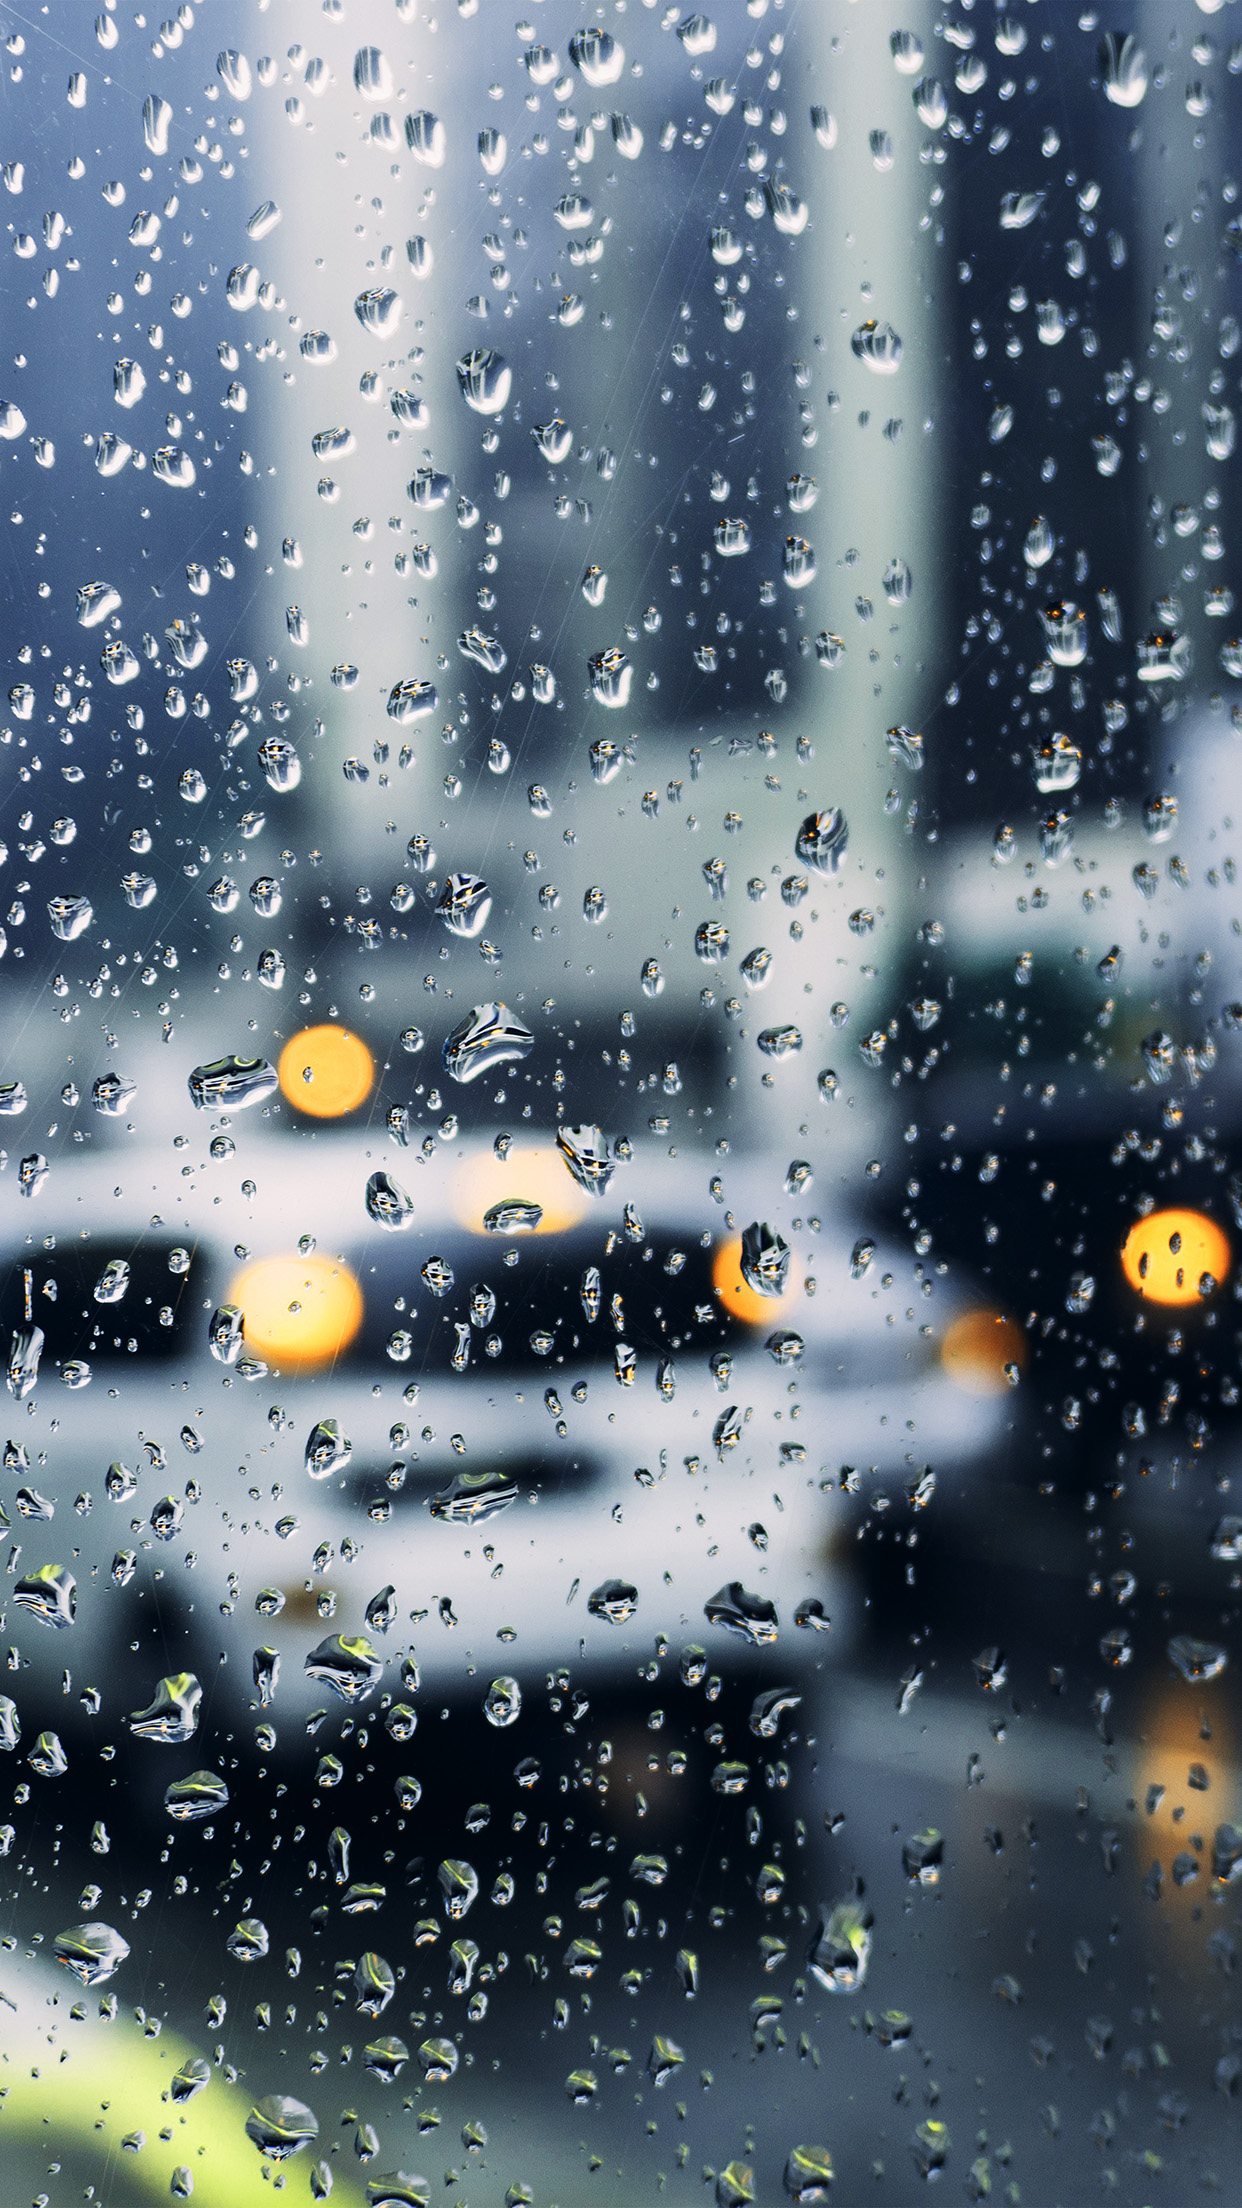 iPhone6papers com | iPhone 6 wallpaper | nj01-rain-window